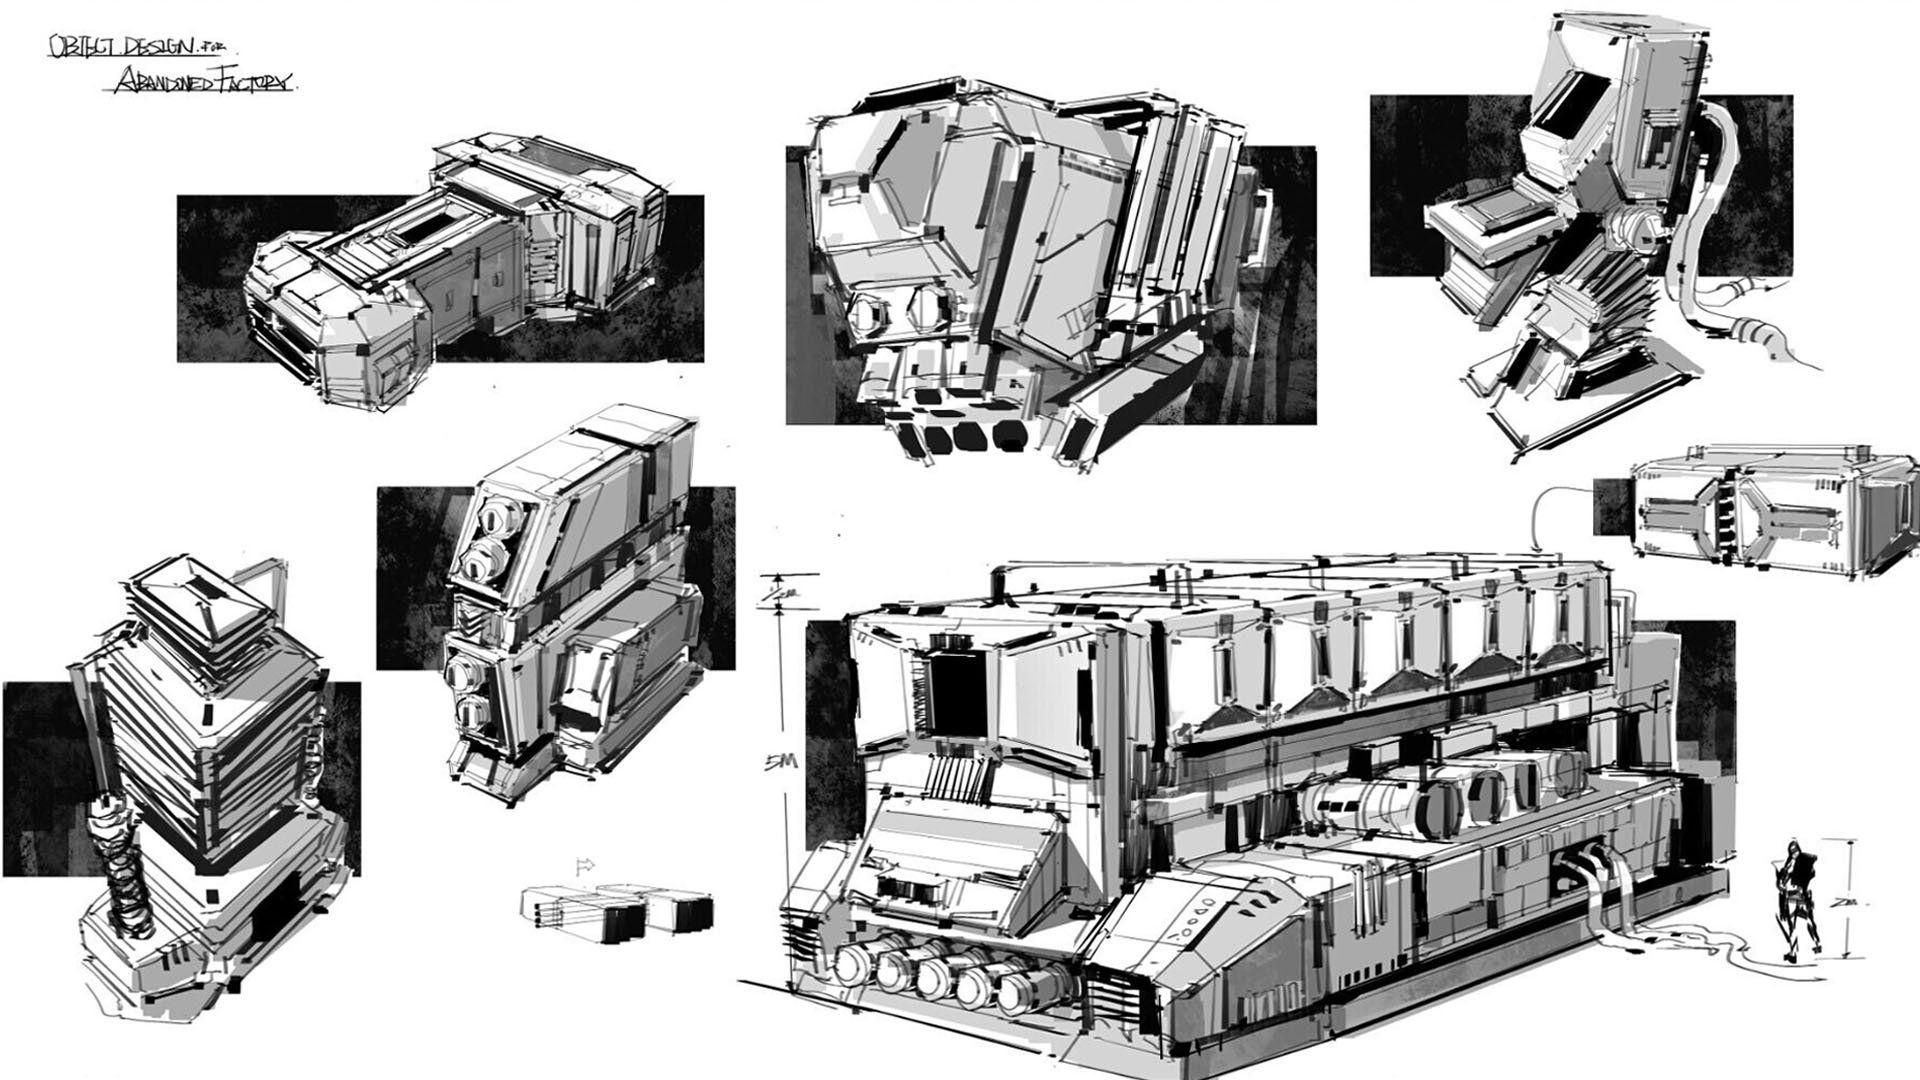 ArtStation - Vehicular Sketches, CONCEPT 4